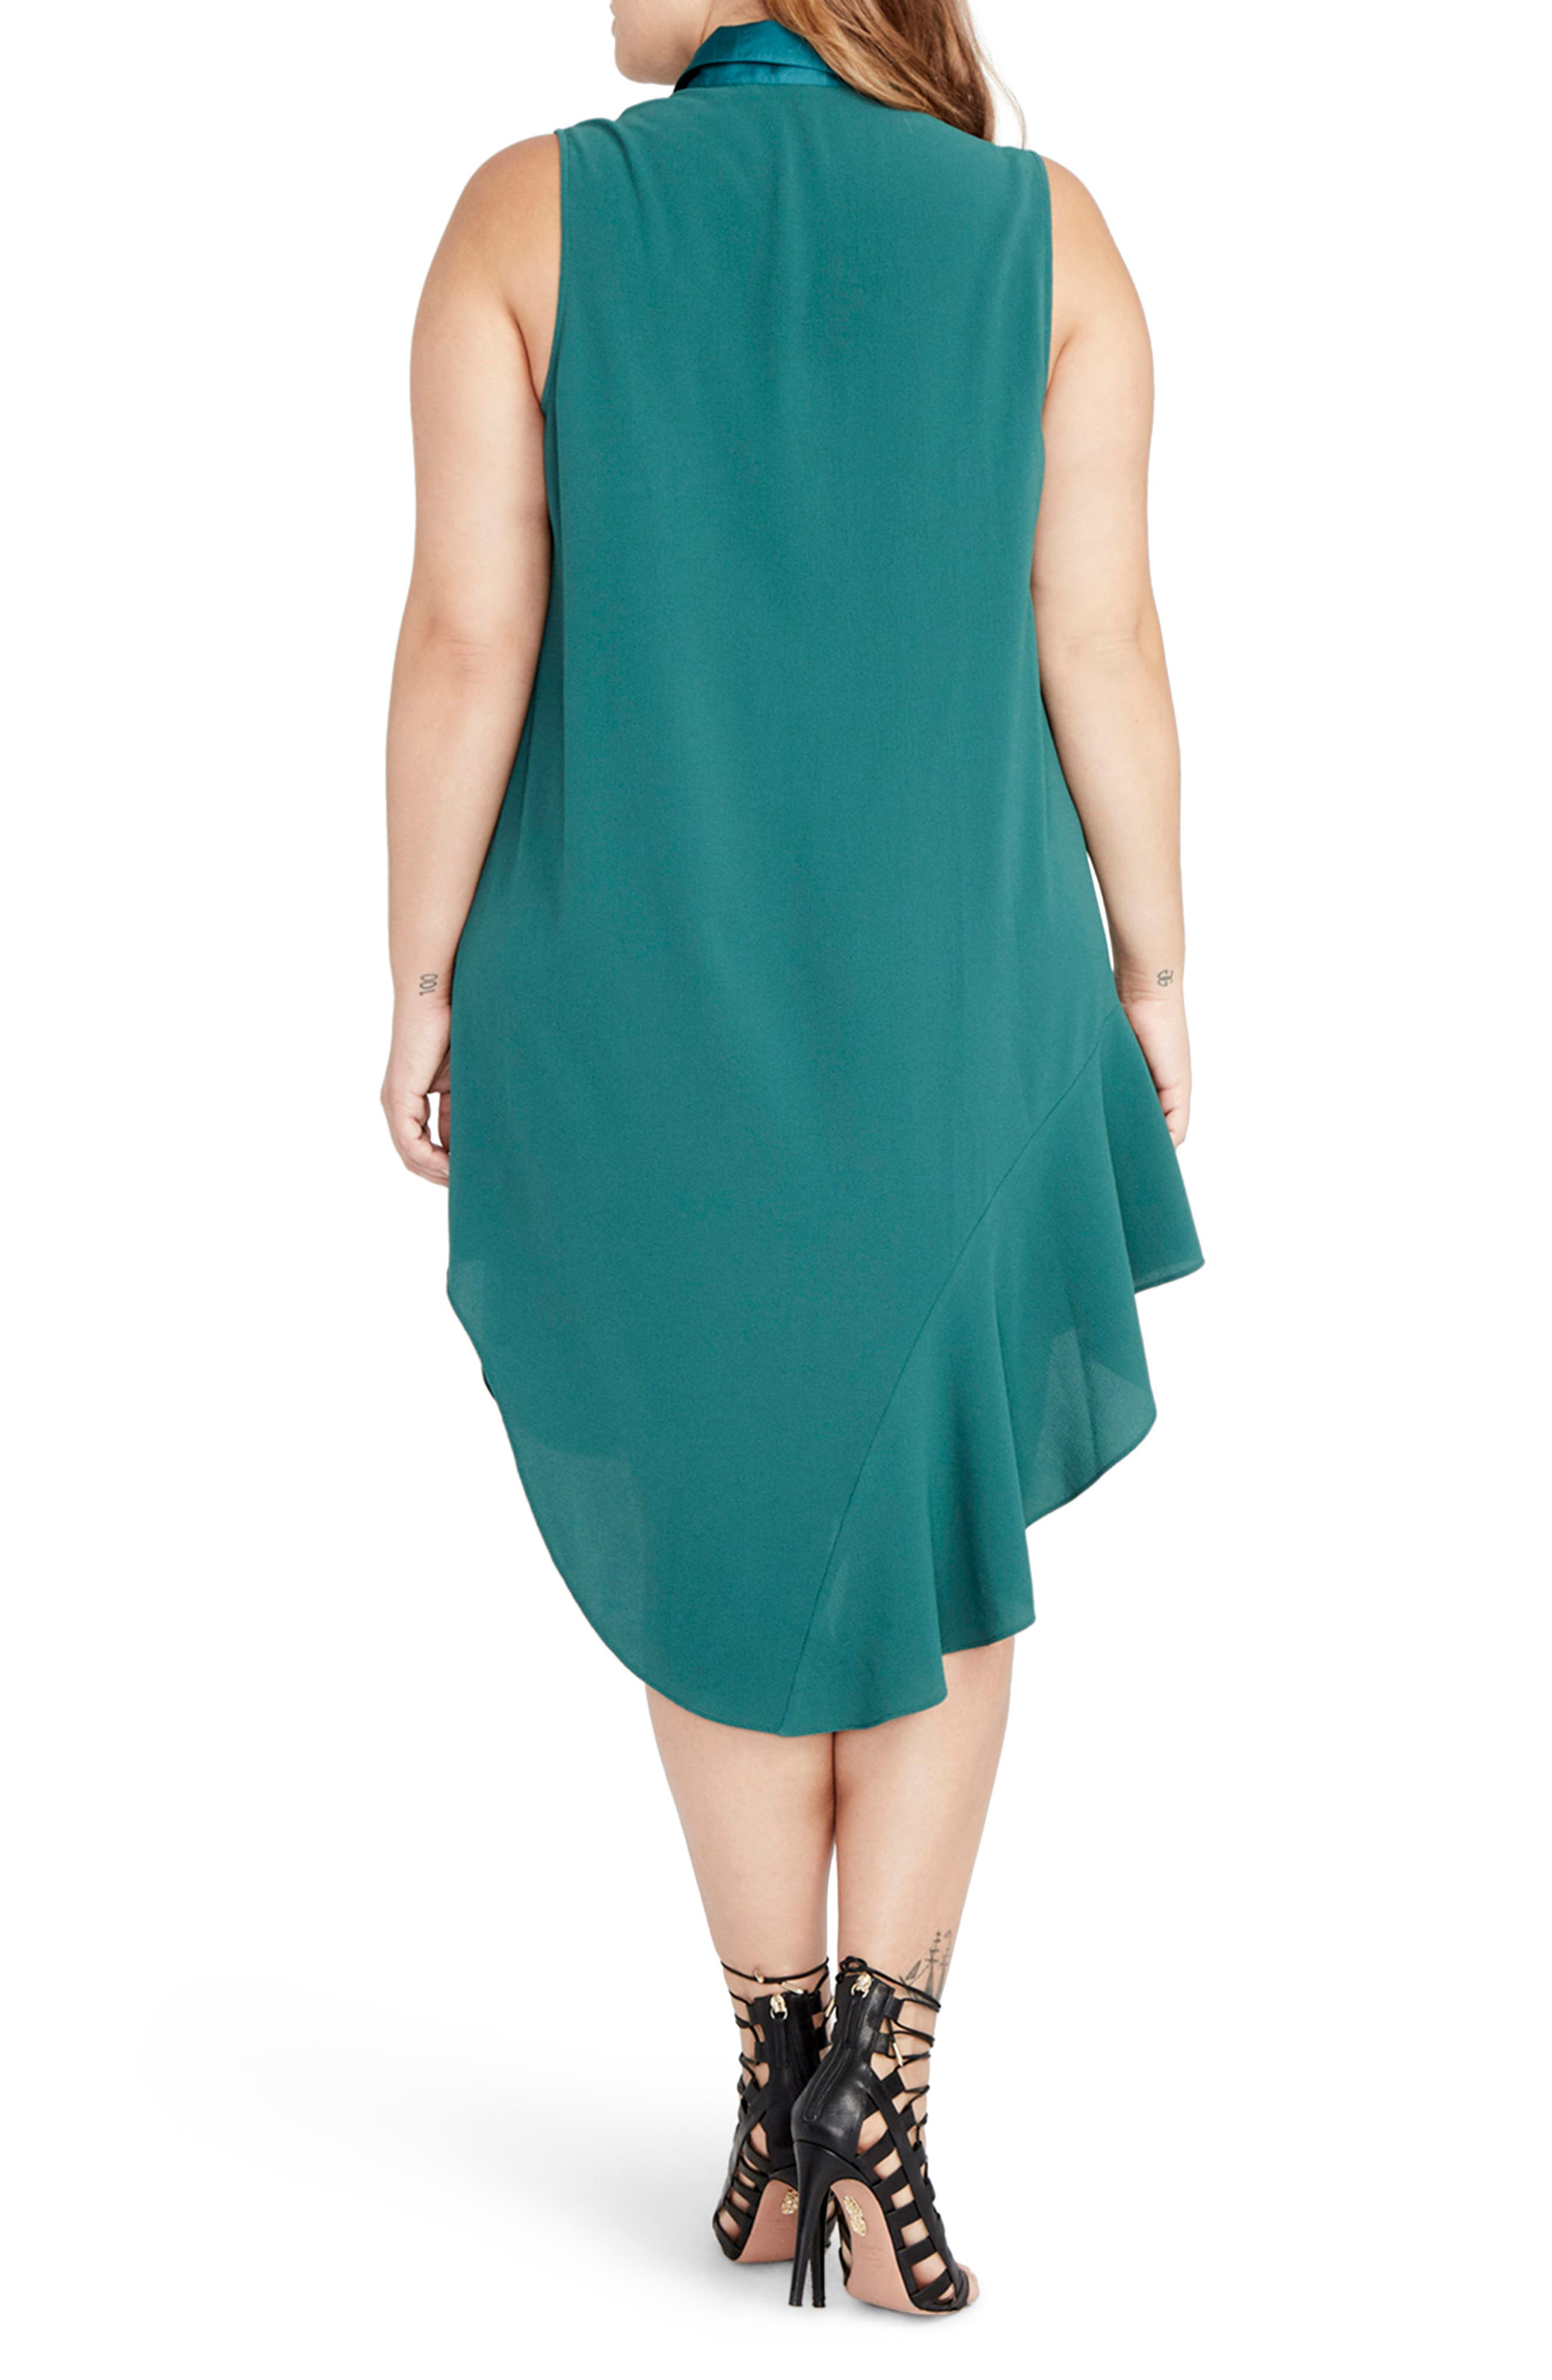 Combo Shirtdress,                             Alternate thumbnail 2, color,                             Viridian Green